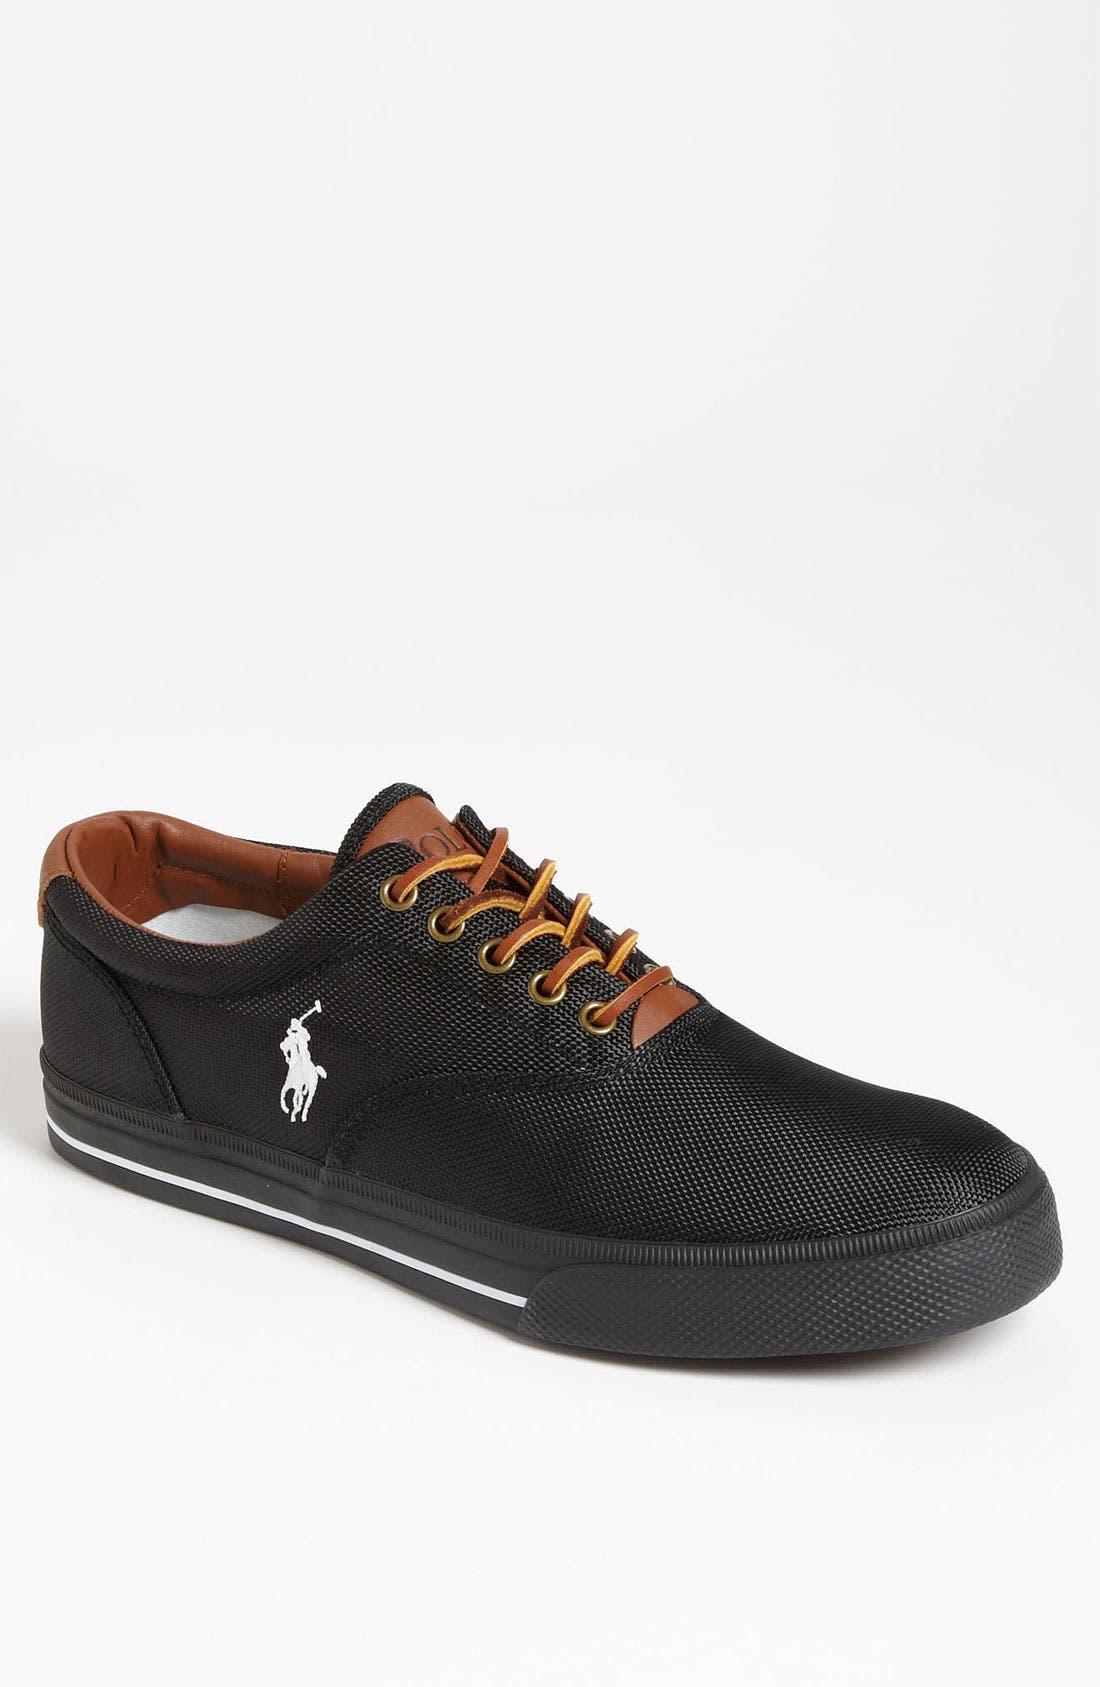 Main Image - Polo Ralph Lauren 'Vaughn' Sneaker